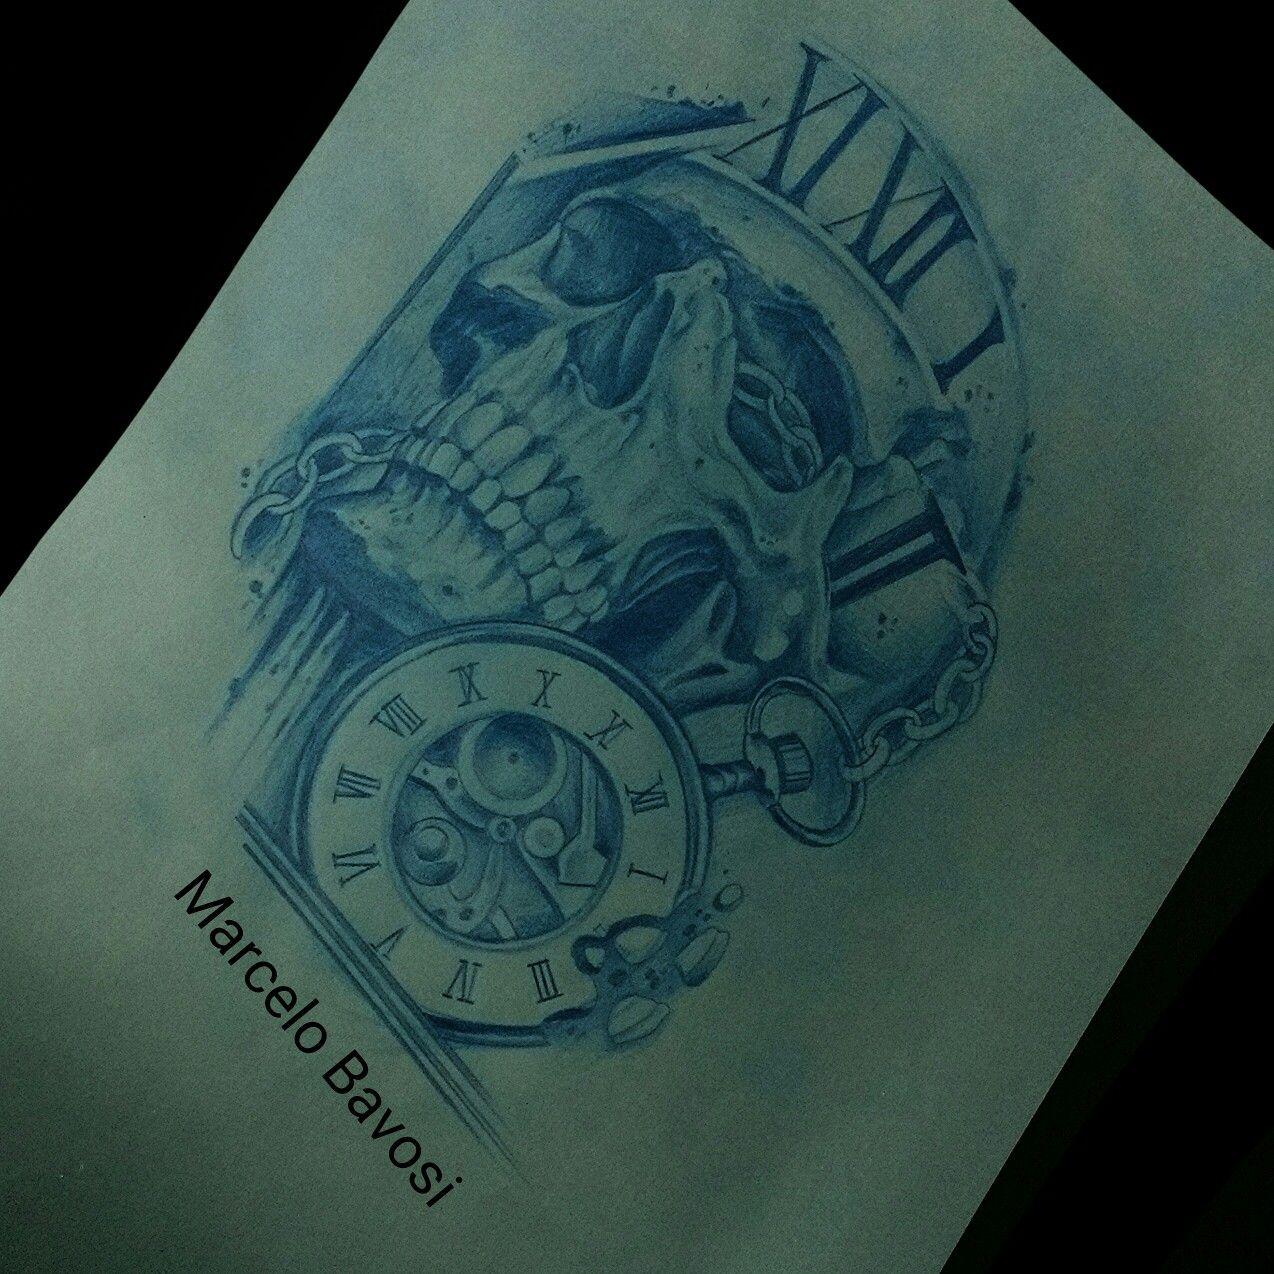 Caveira tattoo